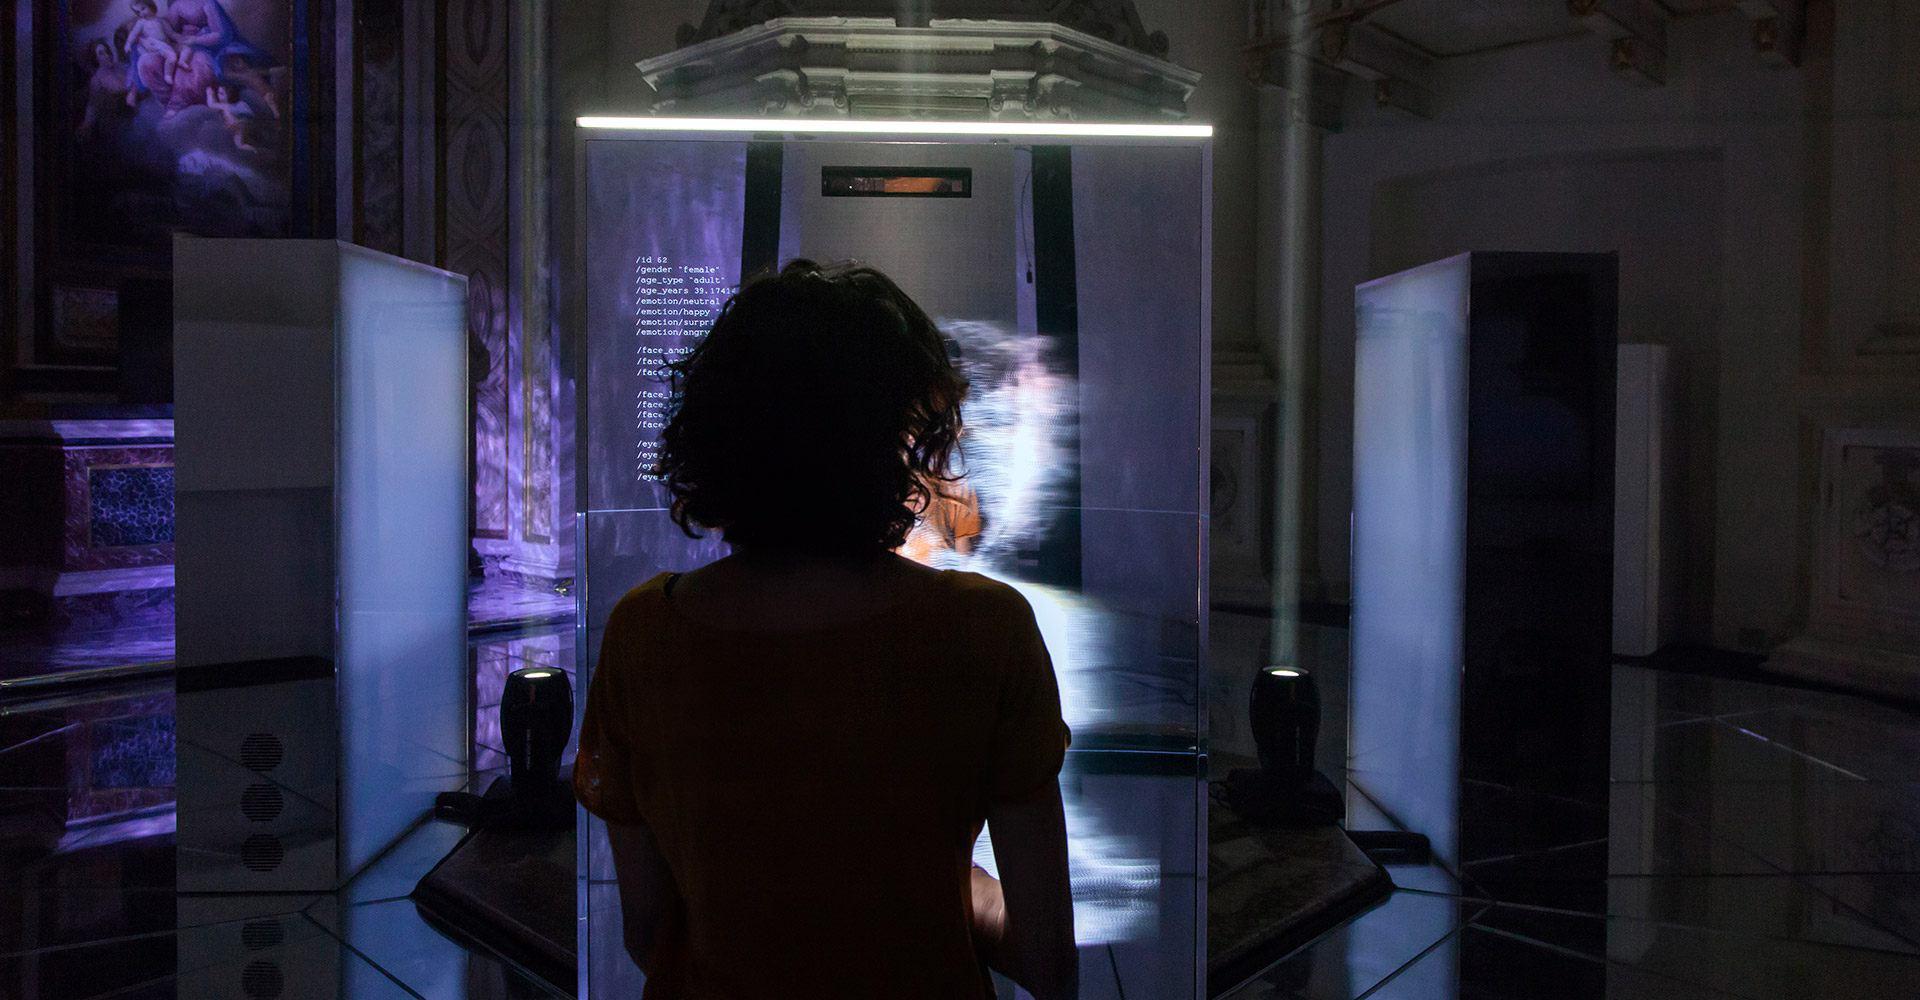 ultravioletto_neural_mirror_4